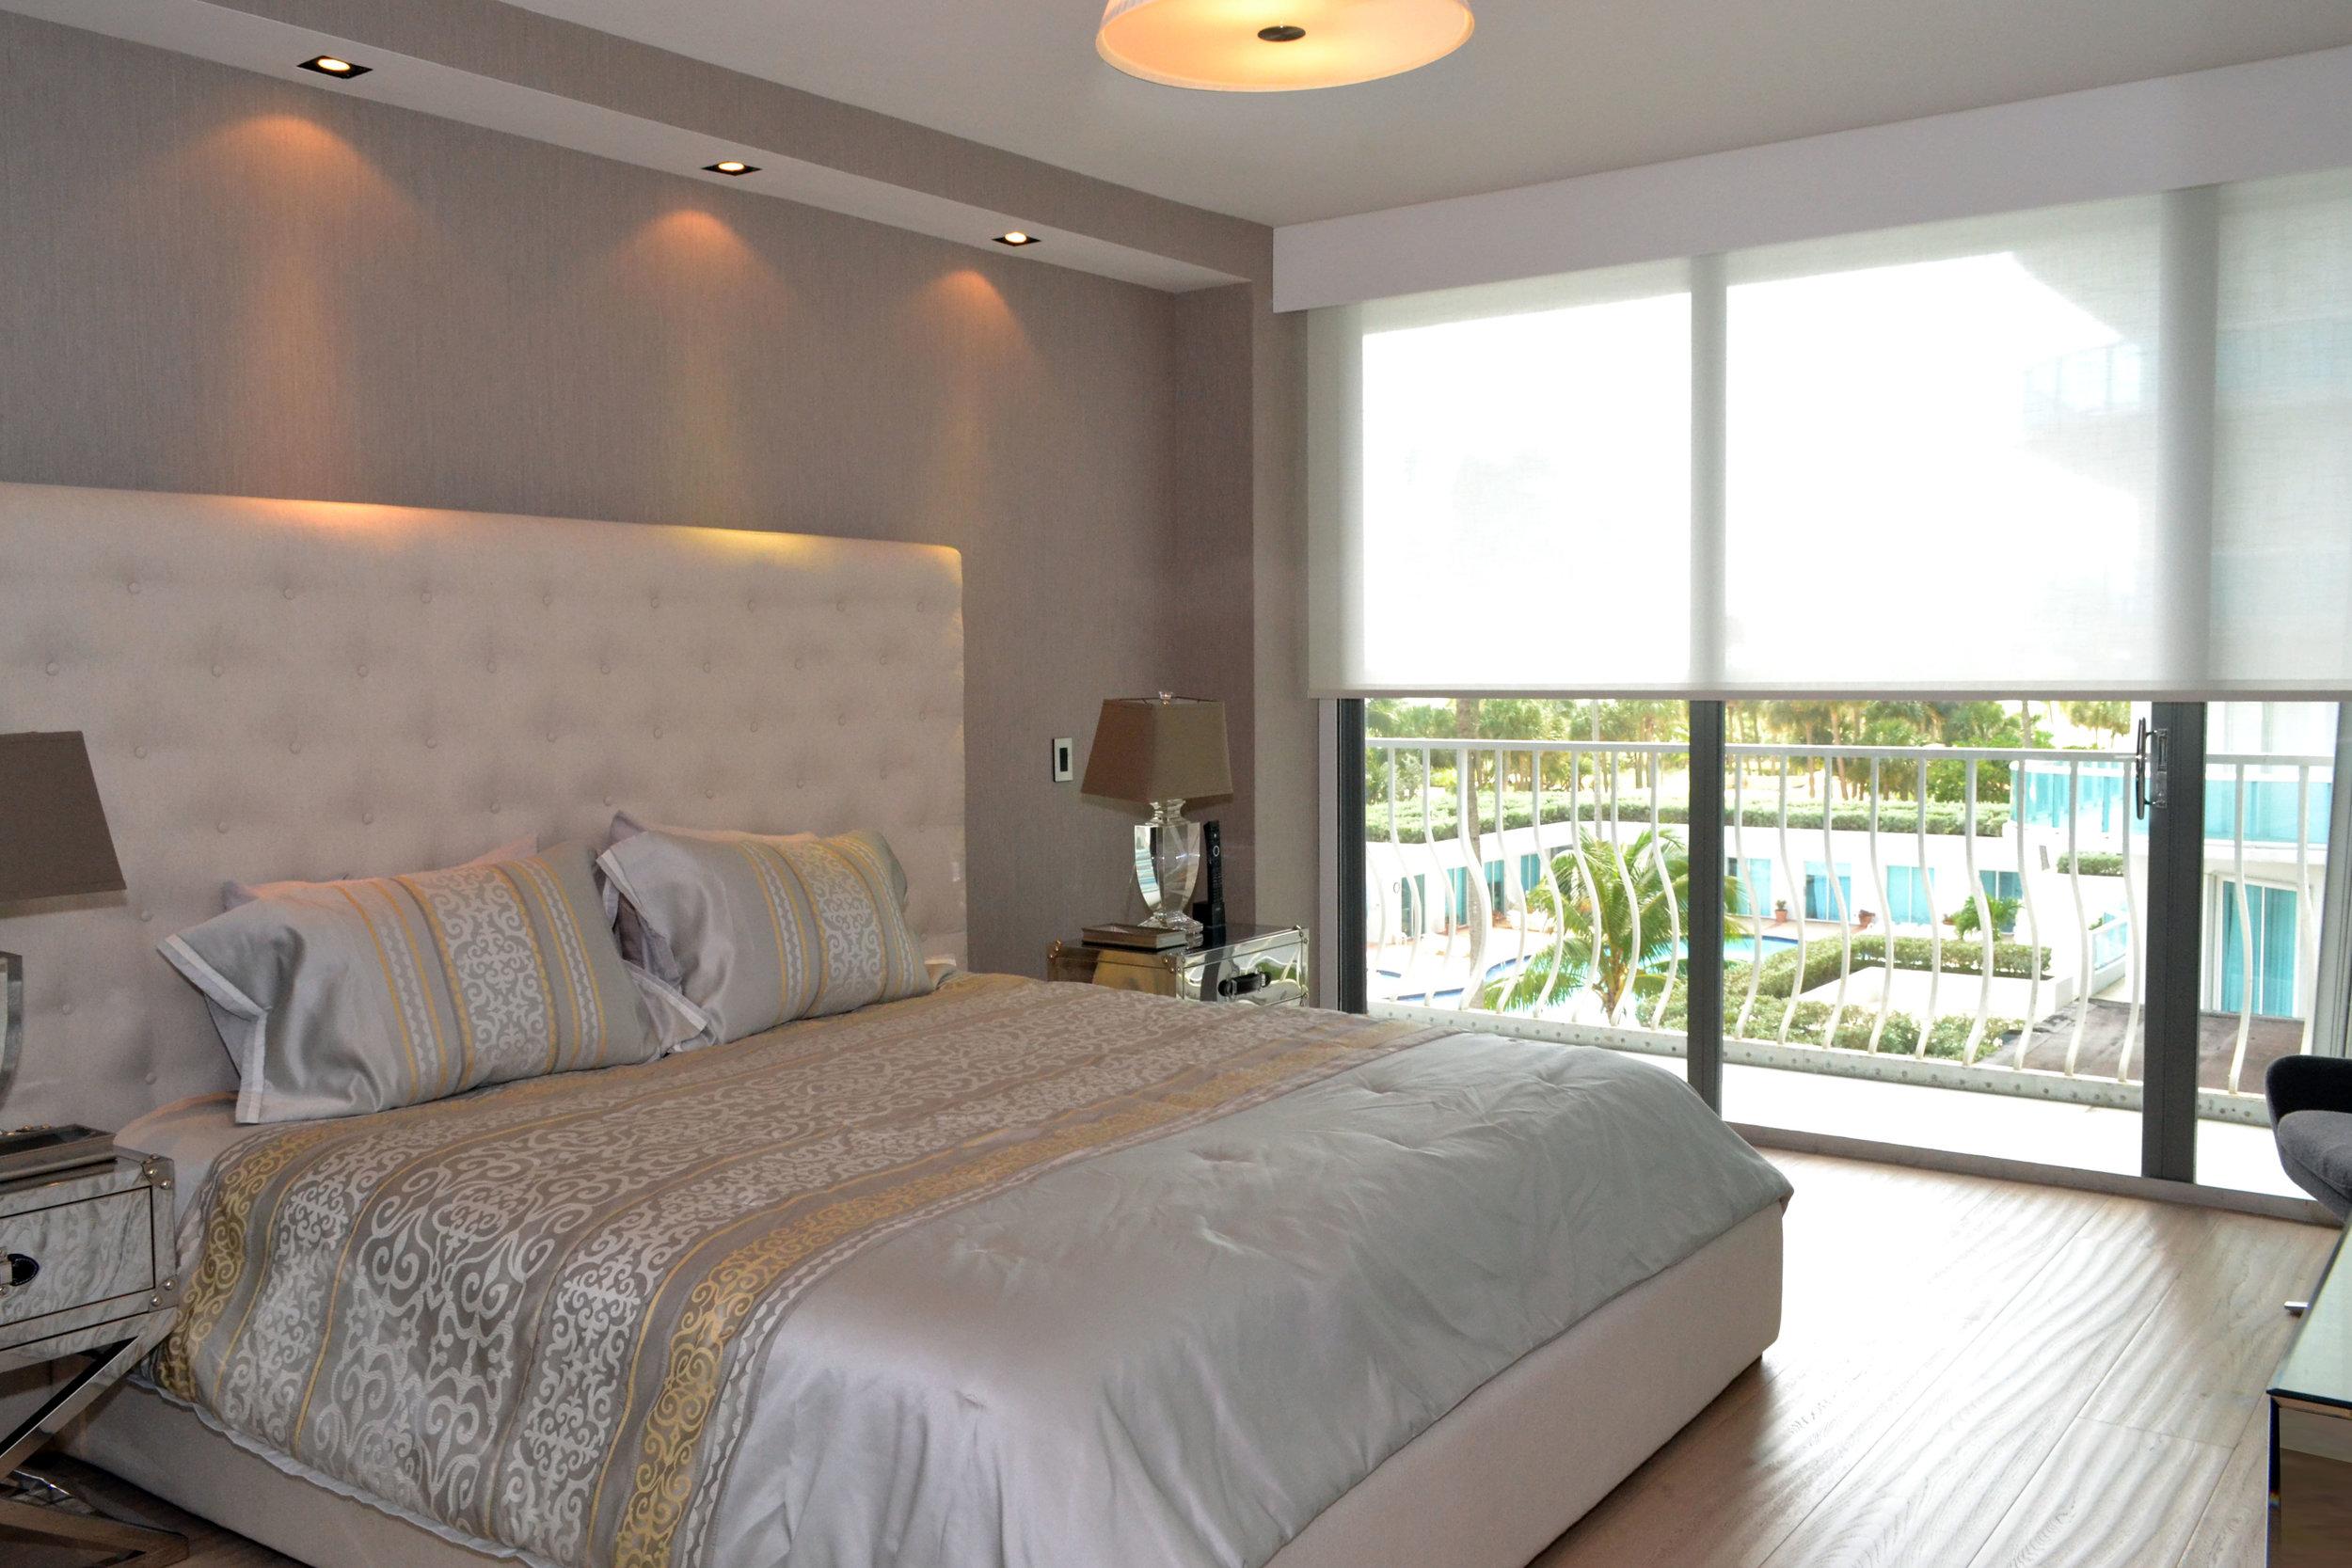 BRG-Bed1.jpg